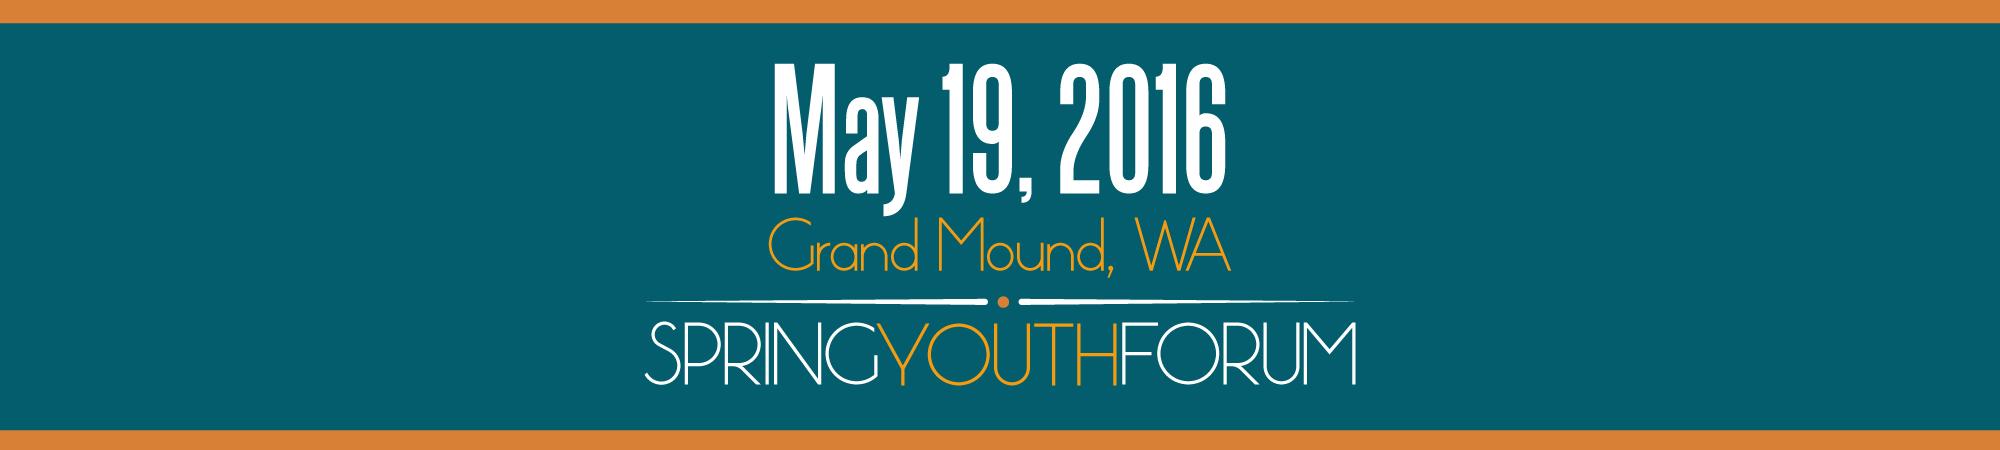 Spring-Youth-Forum_s1_V2